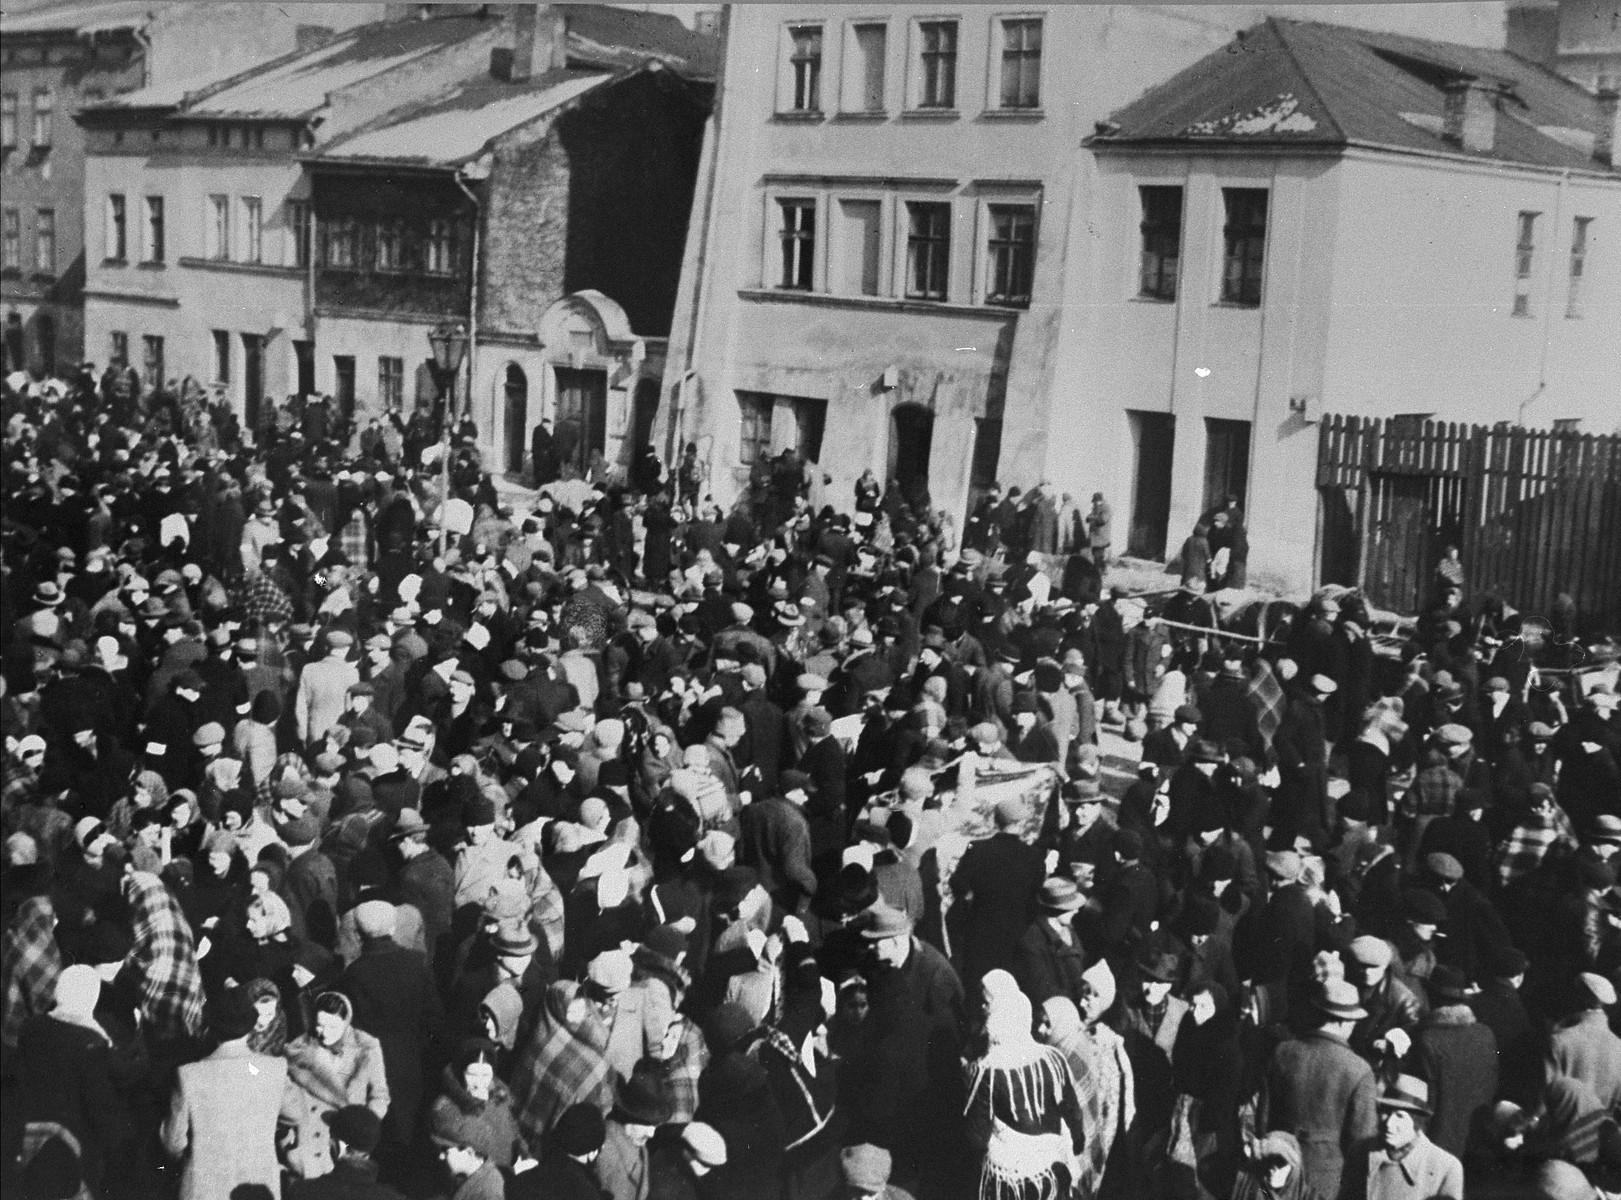 A crowd of Jews fill the market square in t Szeroka, Kazimiersz.